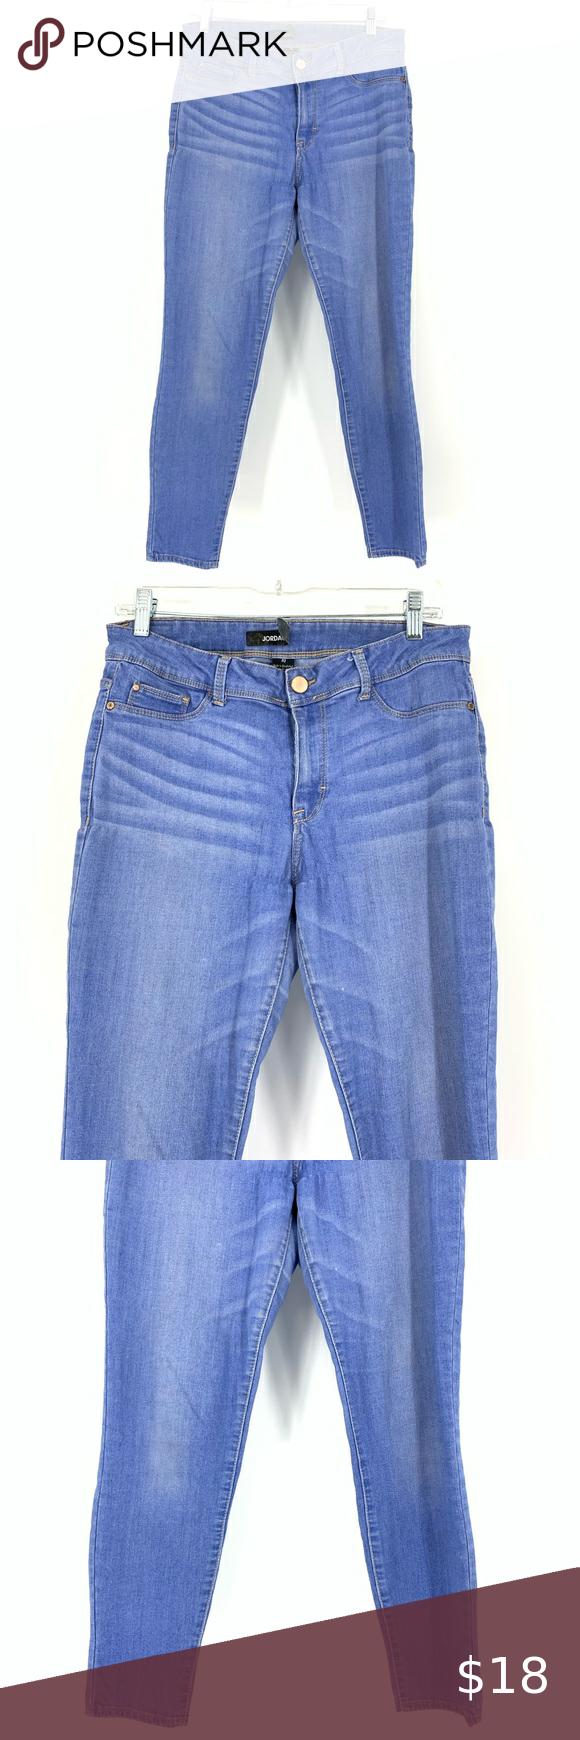 Jordache Super Skinny Light Blue Jeans Siz Jordache Super Skinny Light Blue Jeans Size 10 Description Button Light Blue Jeans Womens Jeans Skinny Super Skinny